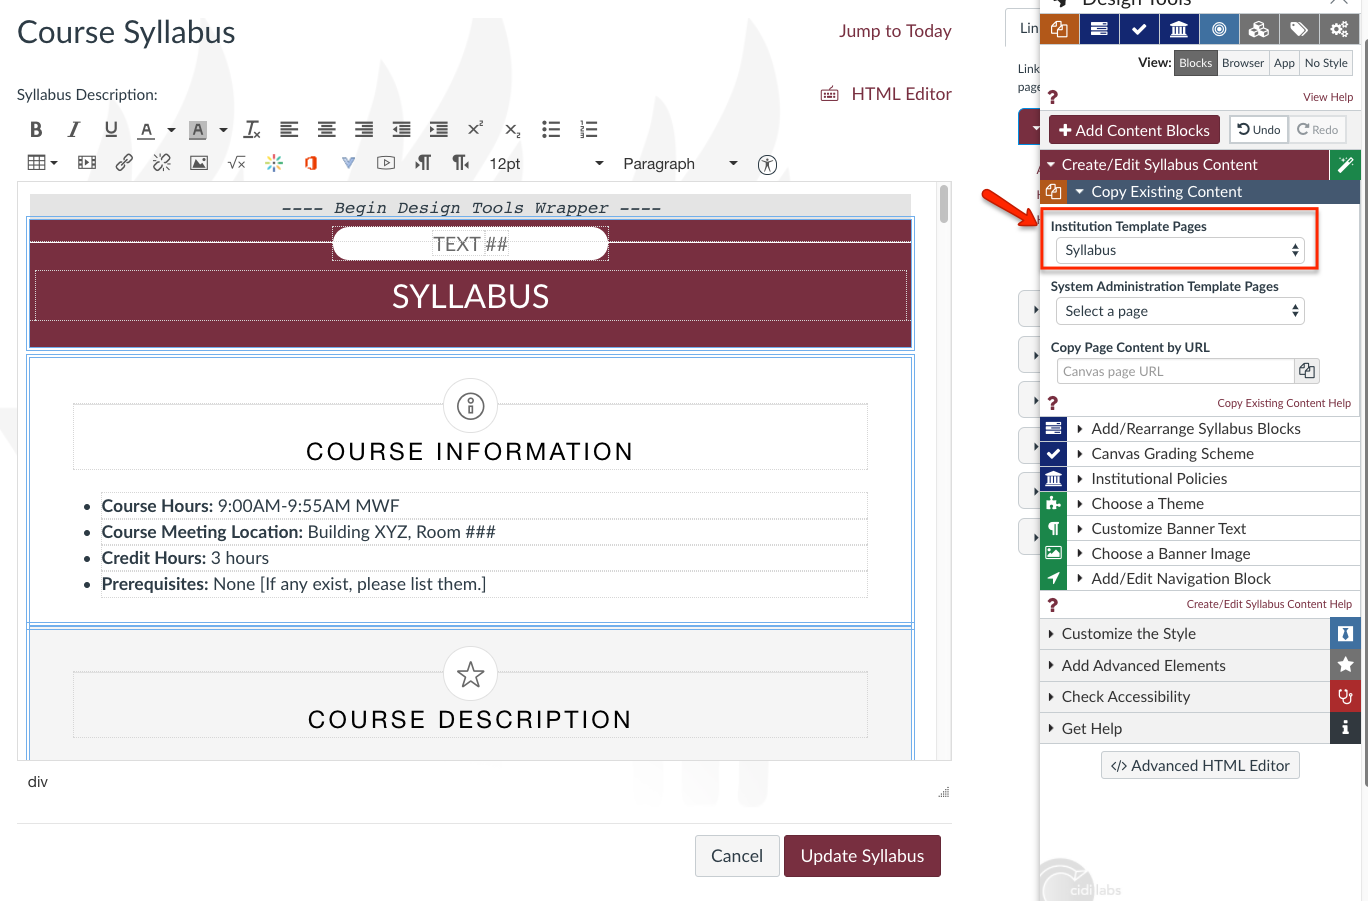 Cidi Labs Design Tools: Building a Syllabus Page - FSU